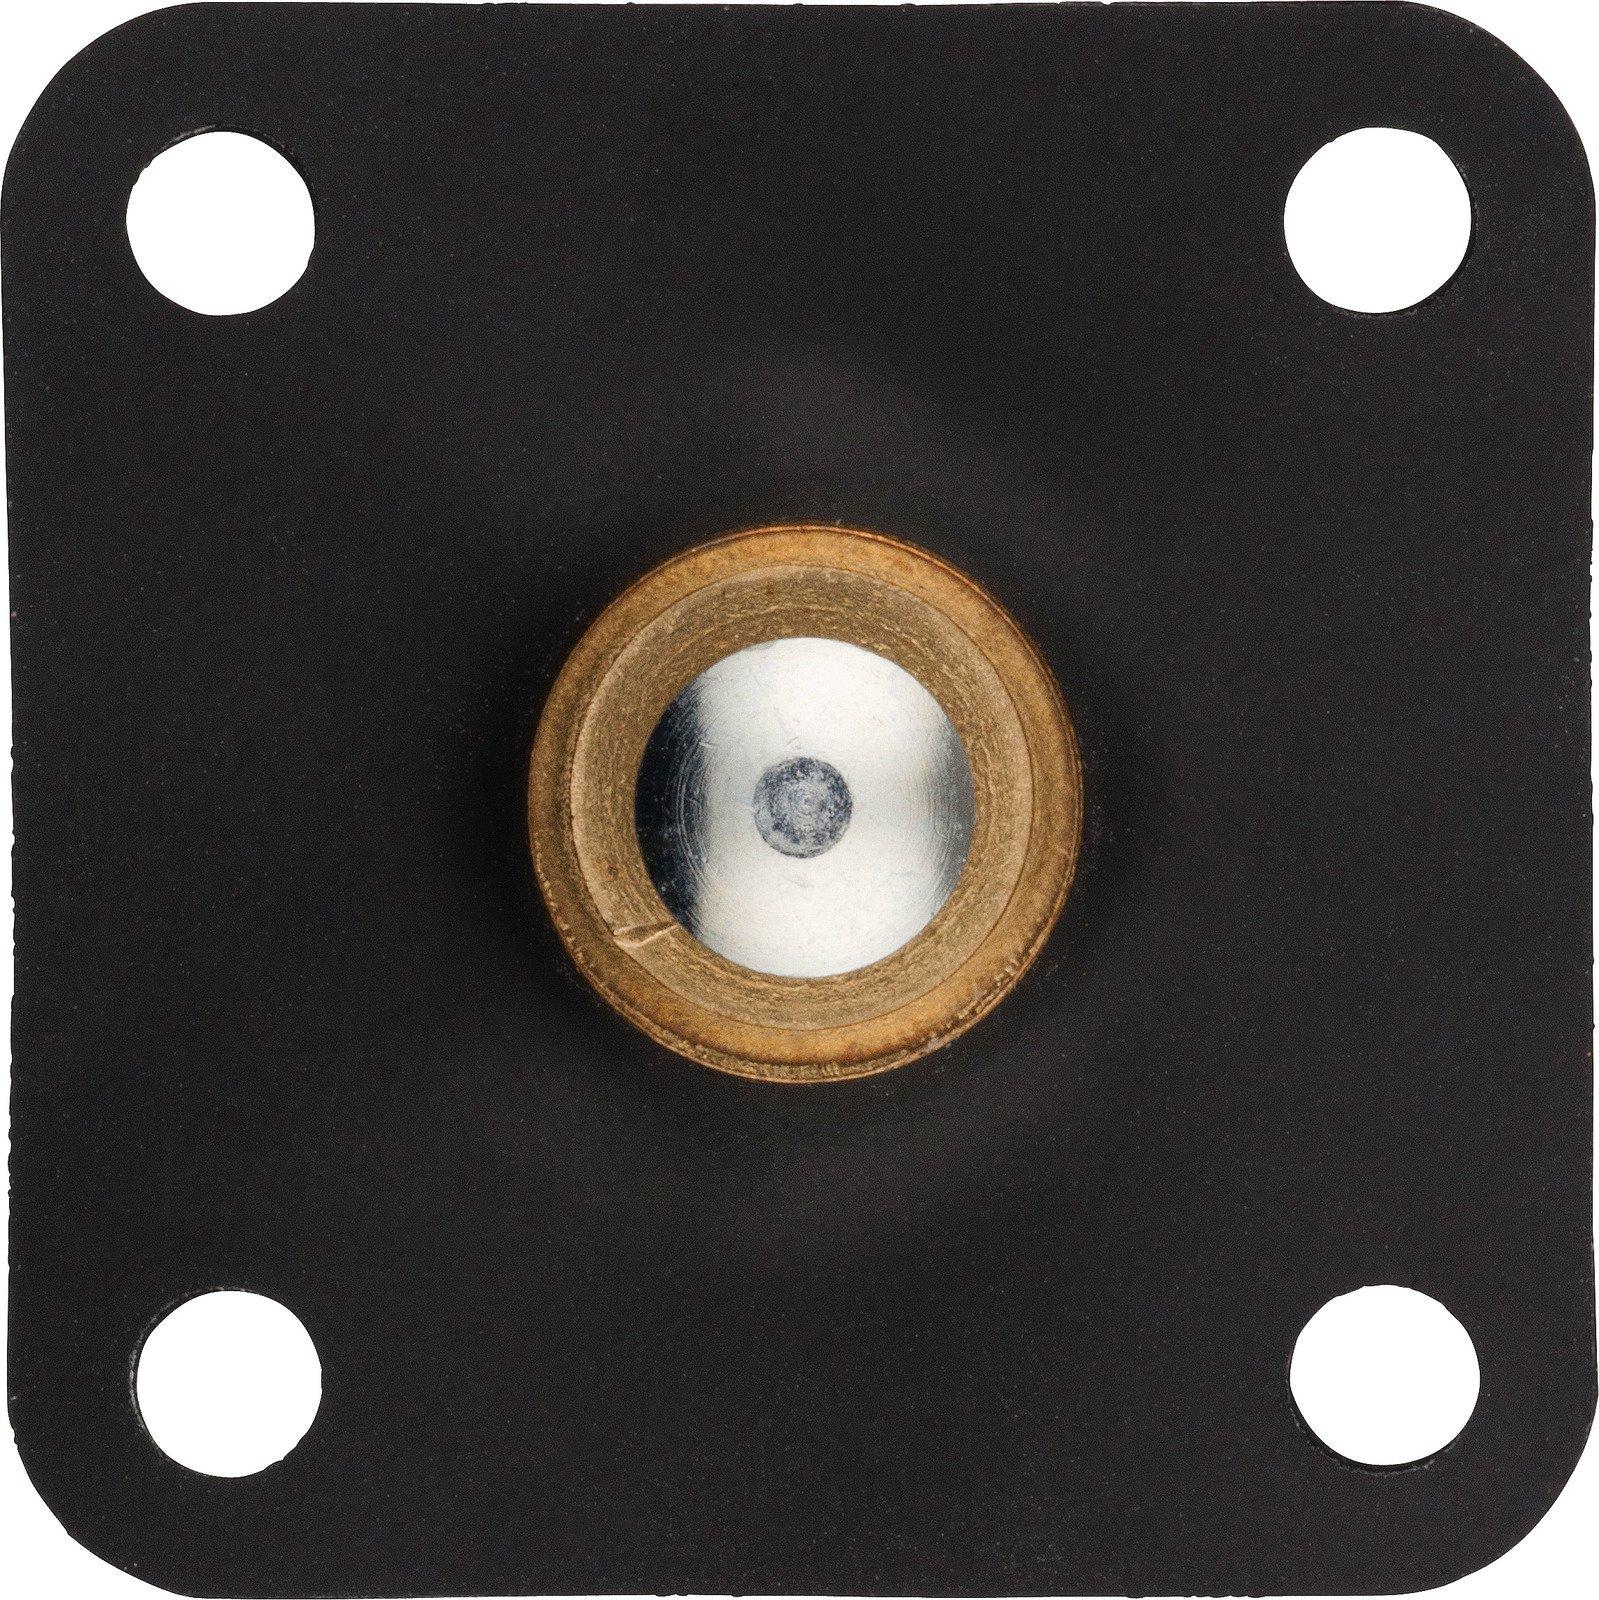 Accelerator Pump Diaphragm w/ 12mm Pin Length For Yamaha SR500 XT500 1980 1981 2-108